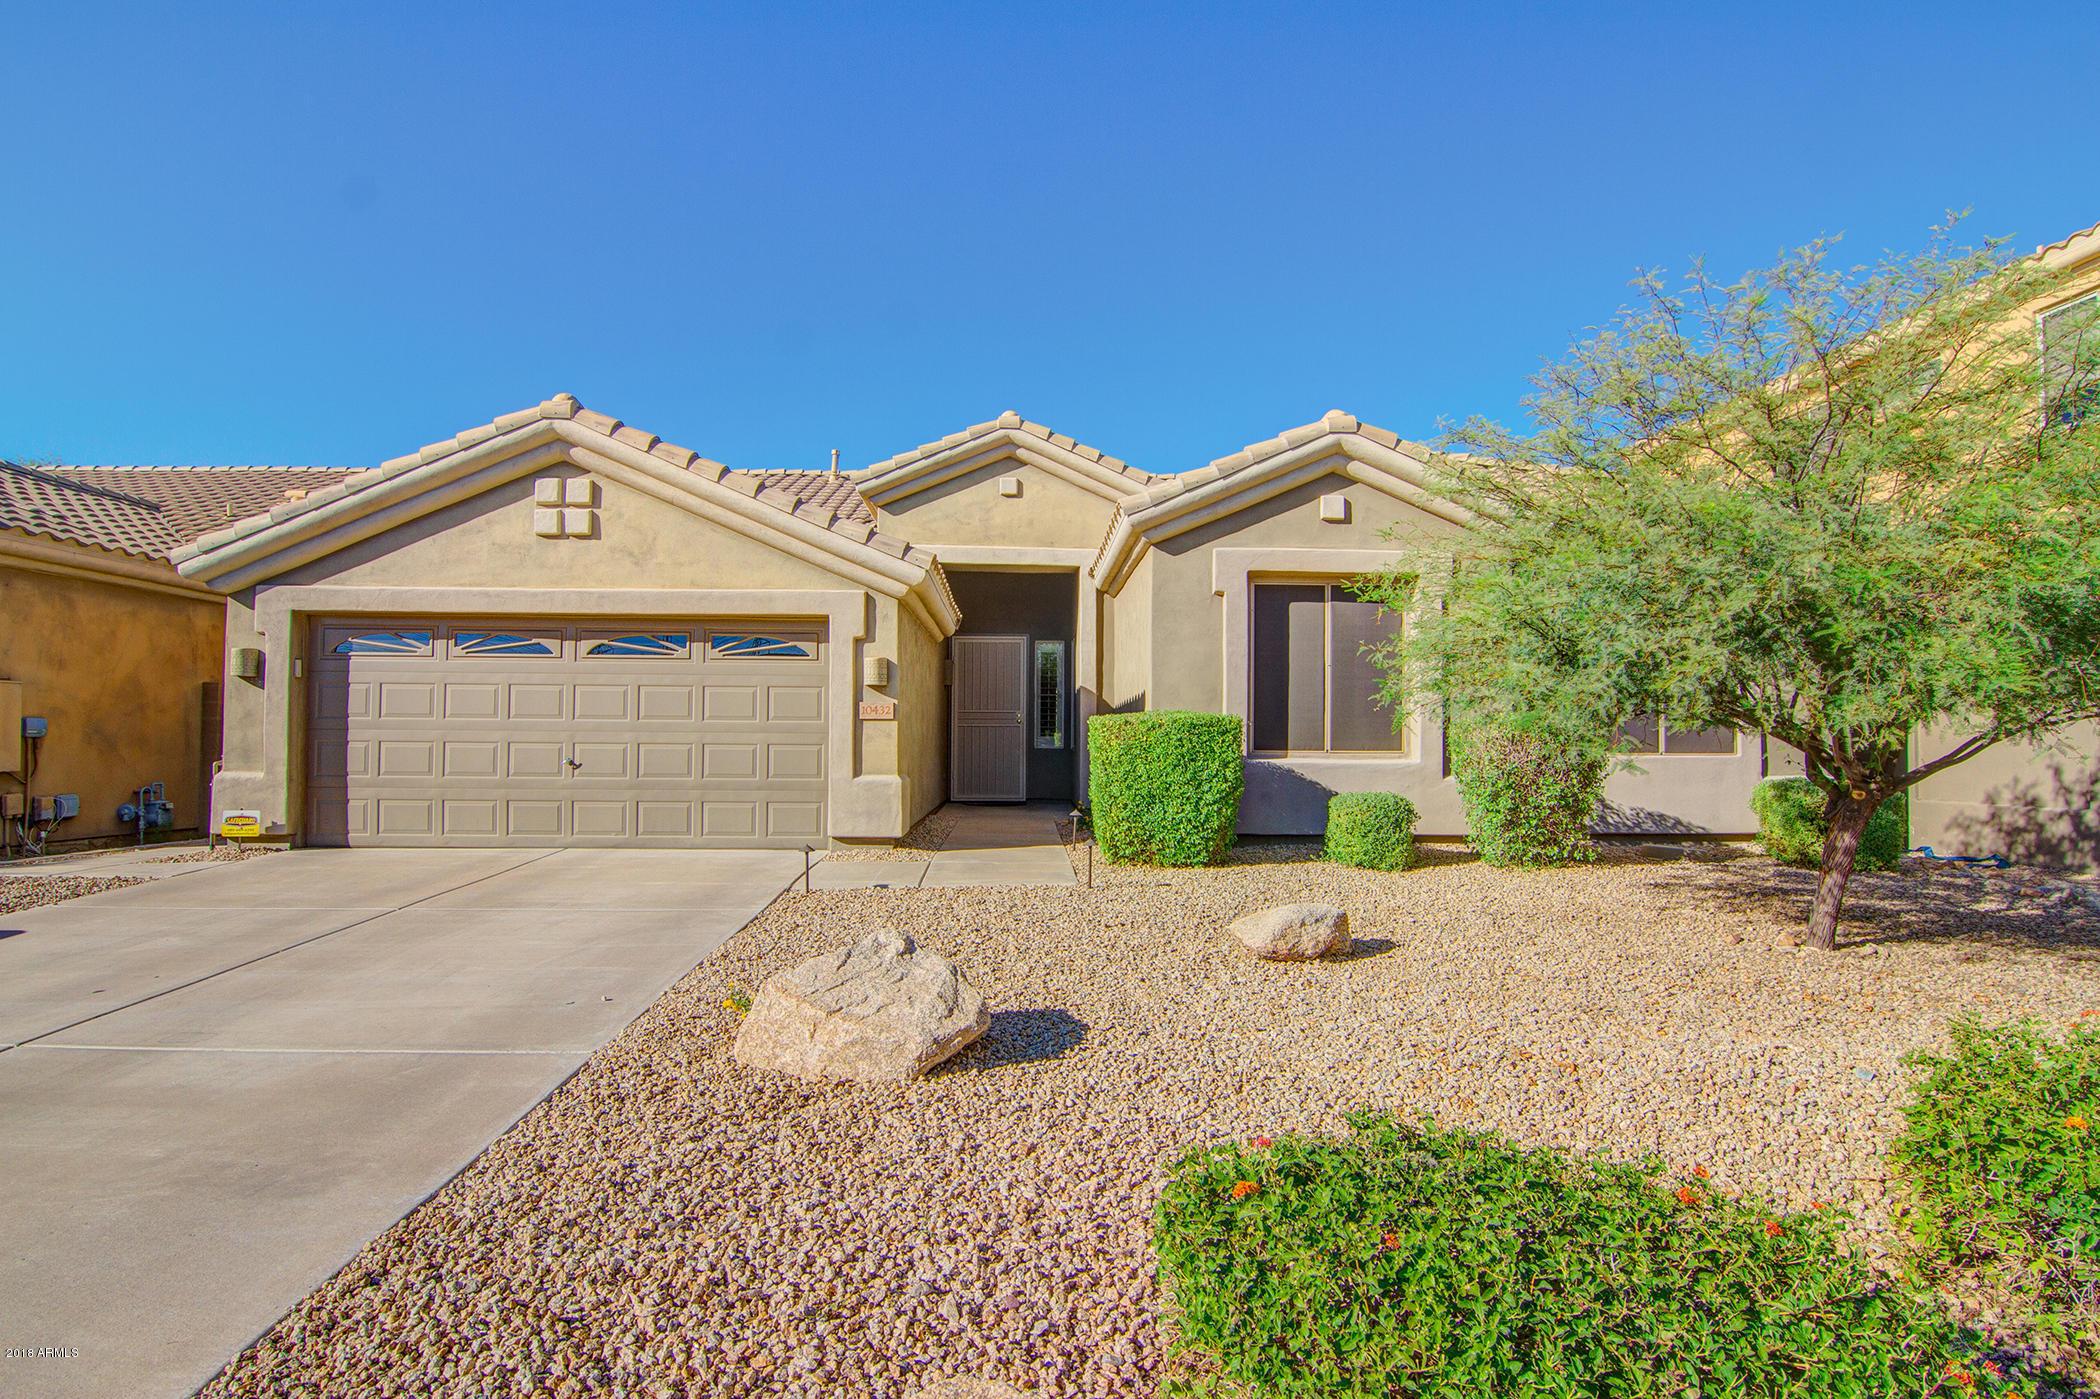 Photo of 10432 E MEADOWHILL Drive, Scottsdale, AZ 85255